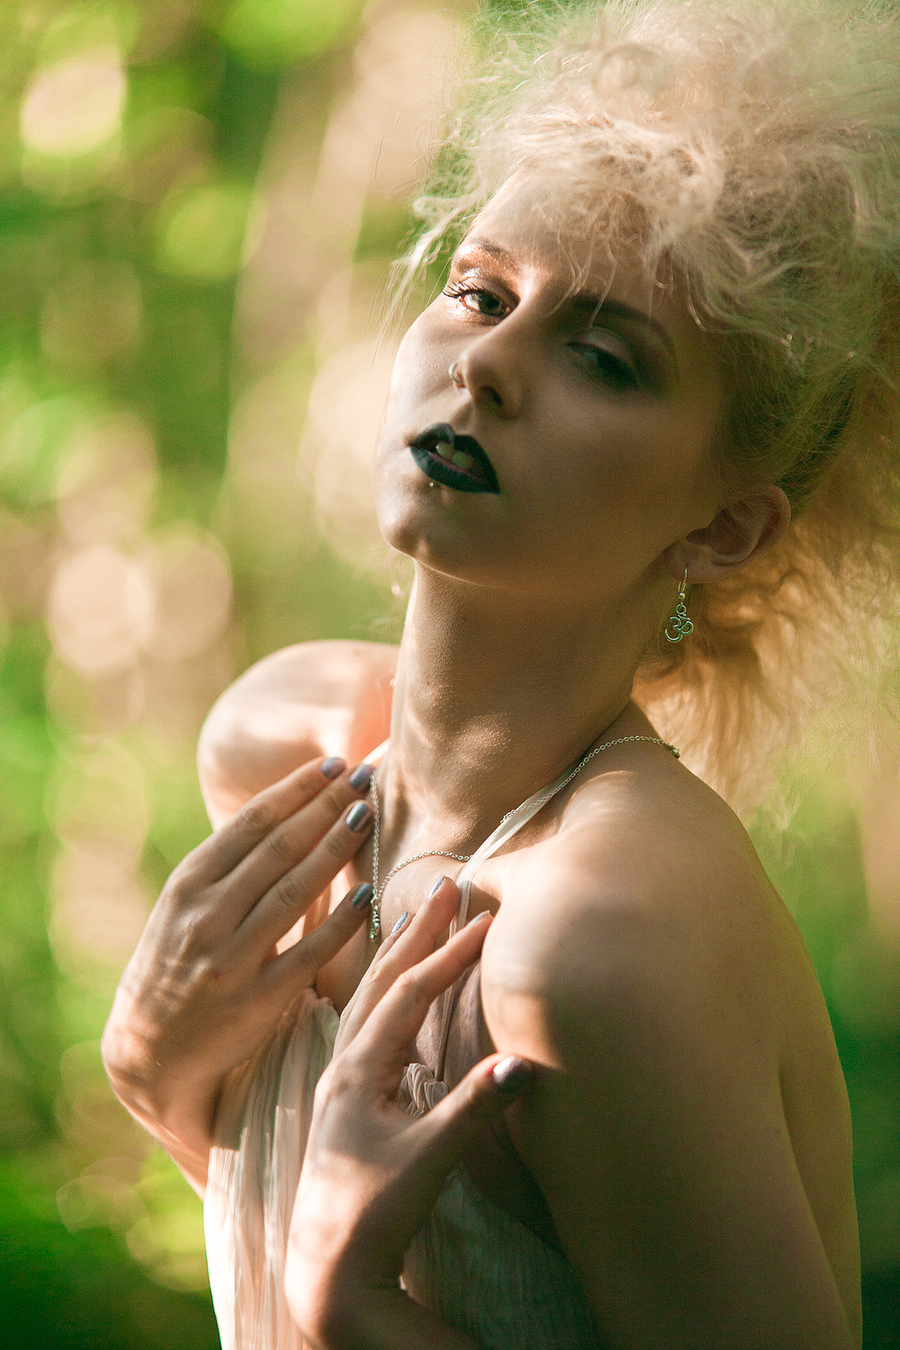 Halo Haynes / Photography by TechNoir Photography, Model Halo Haynes / Uploaded 15th January 2015 @ 12:13 PM